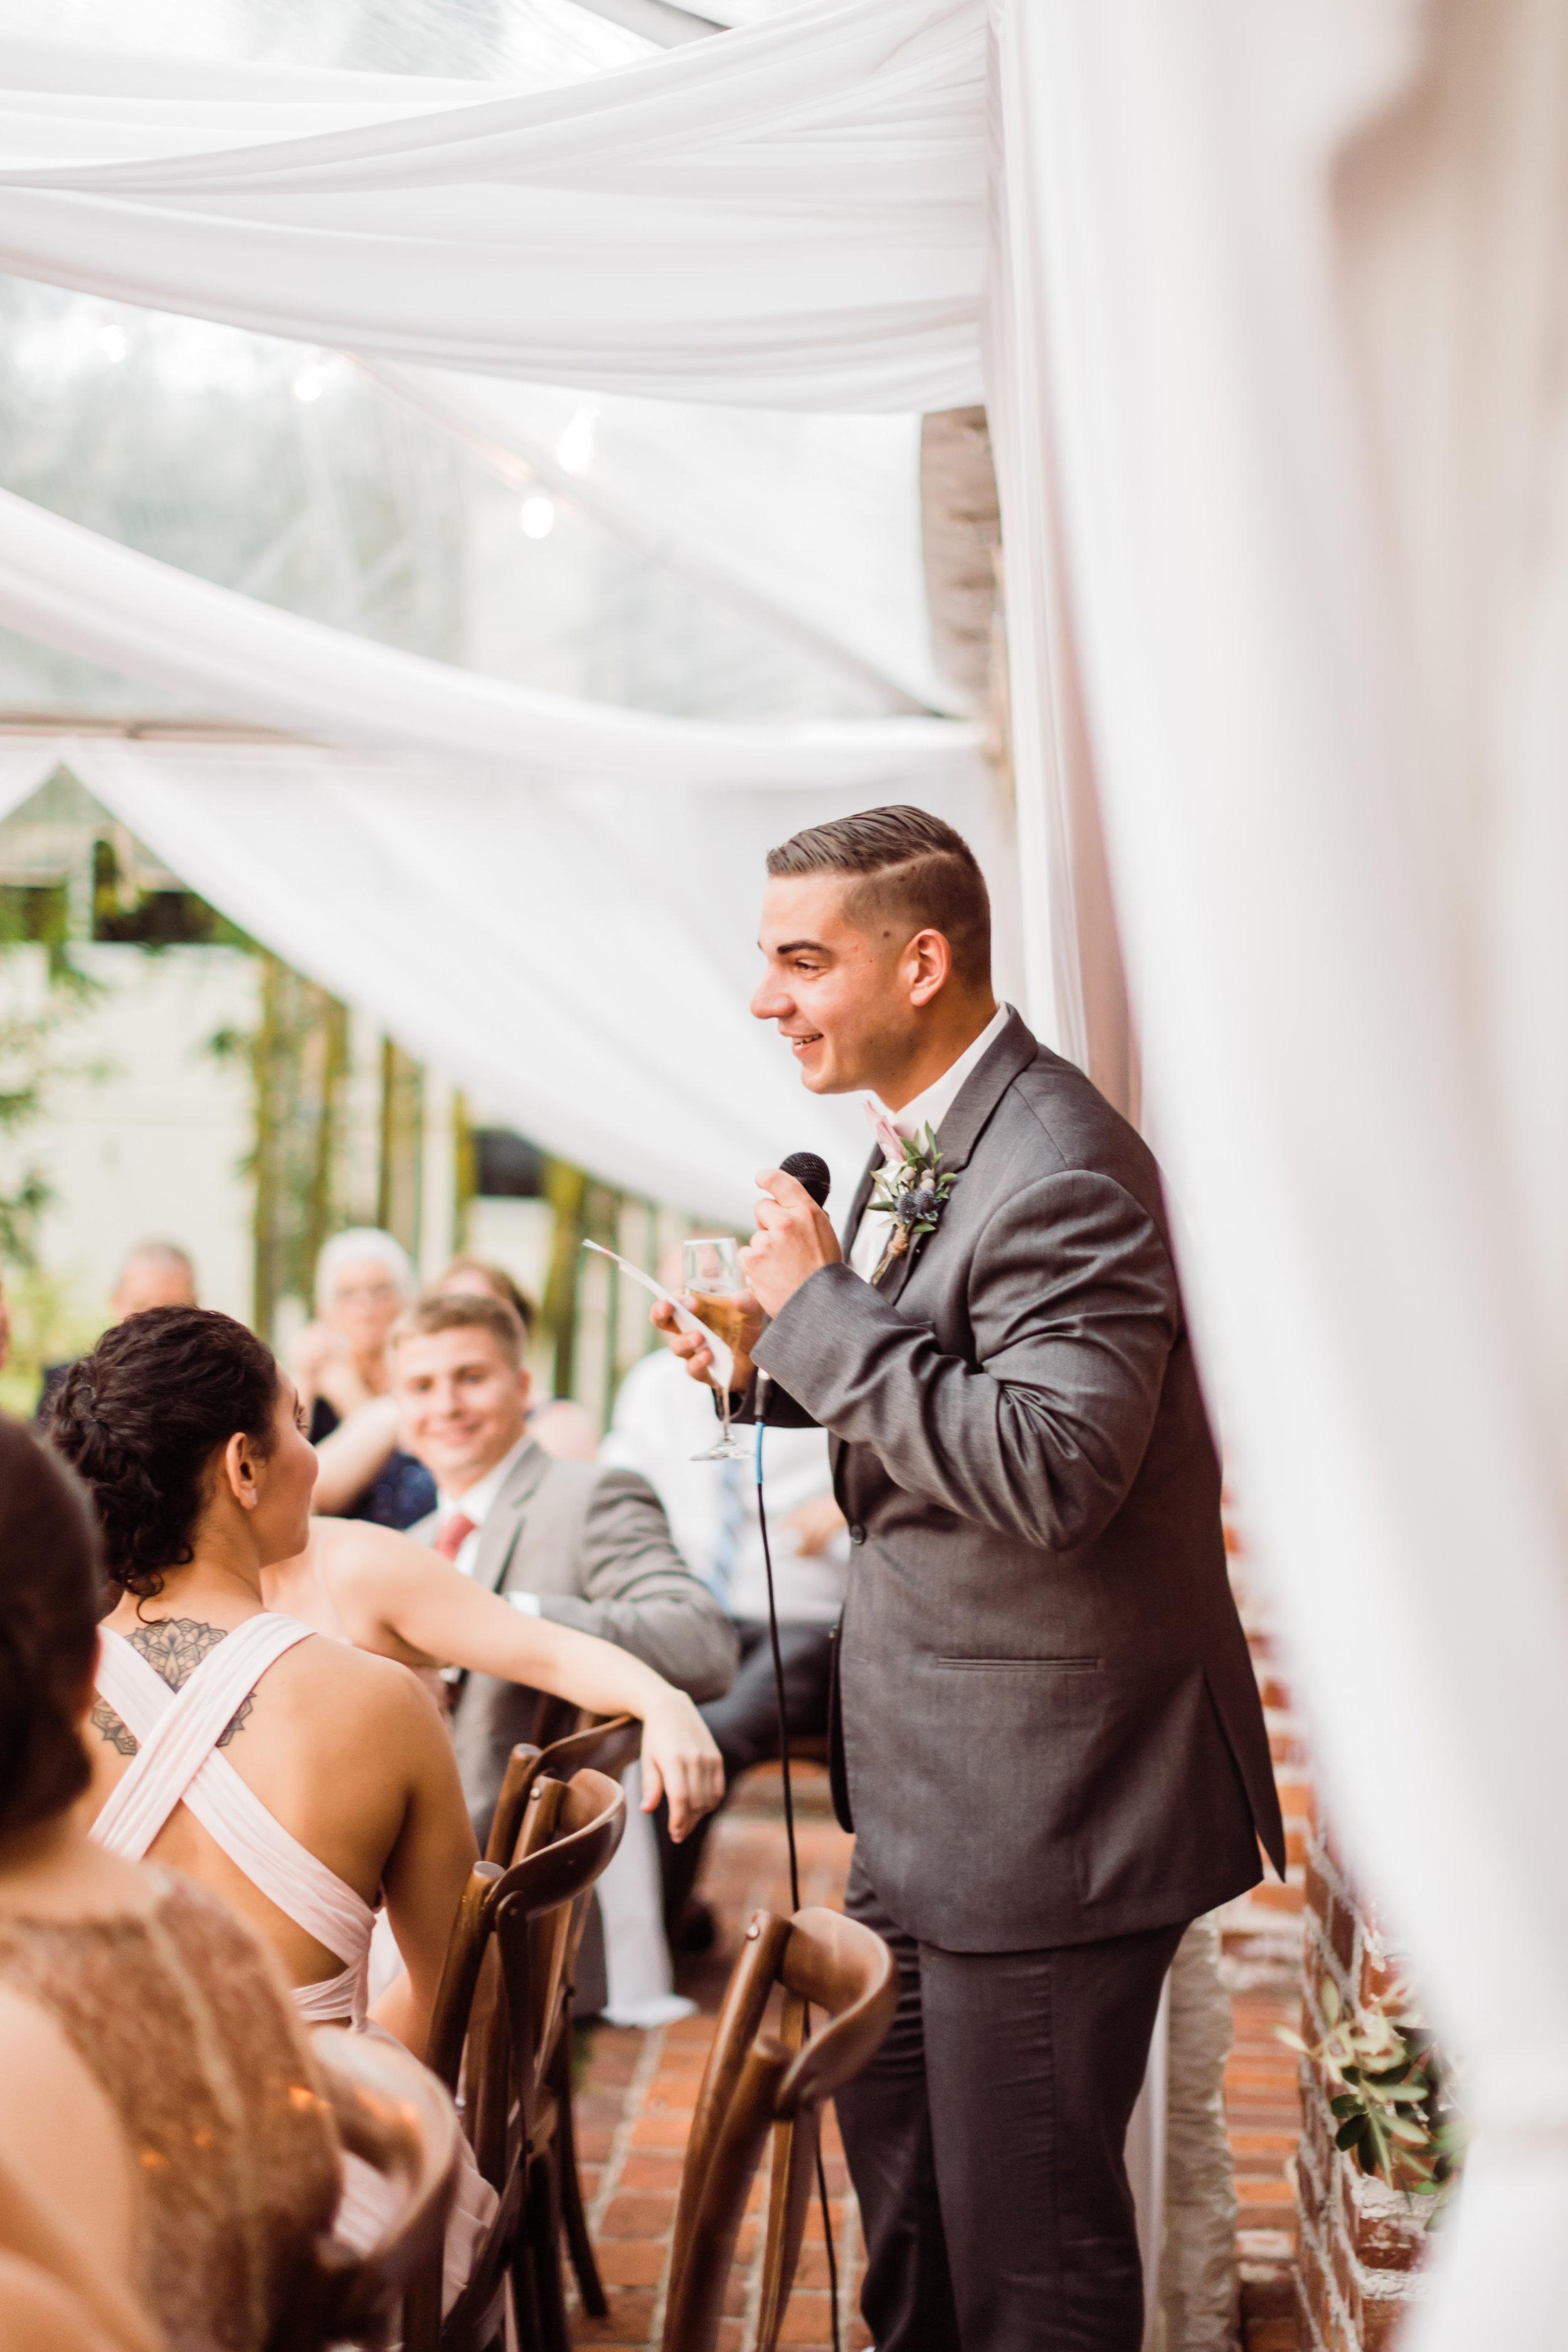 2017.10.15 Steffi and Elliott Simmonds Casa Feliz Wedding (732 of 969).jpg